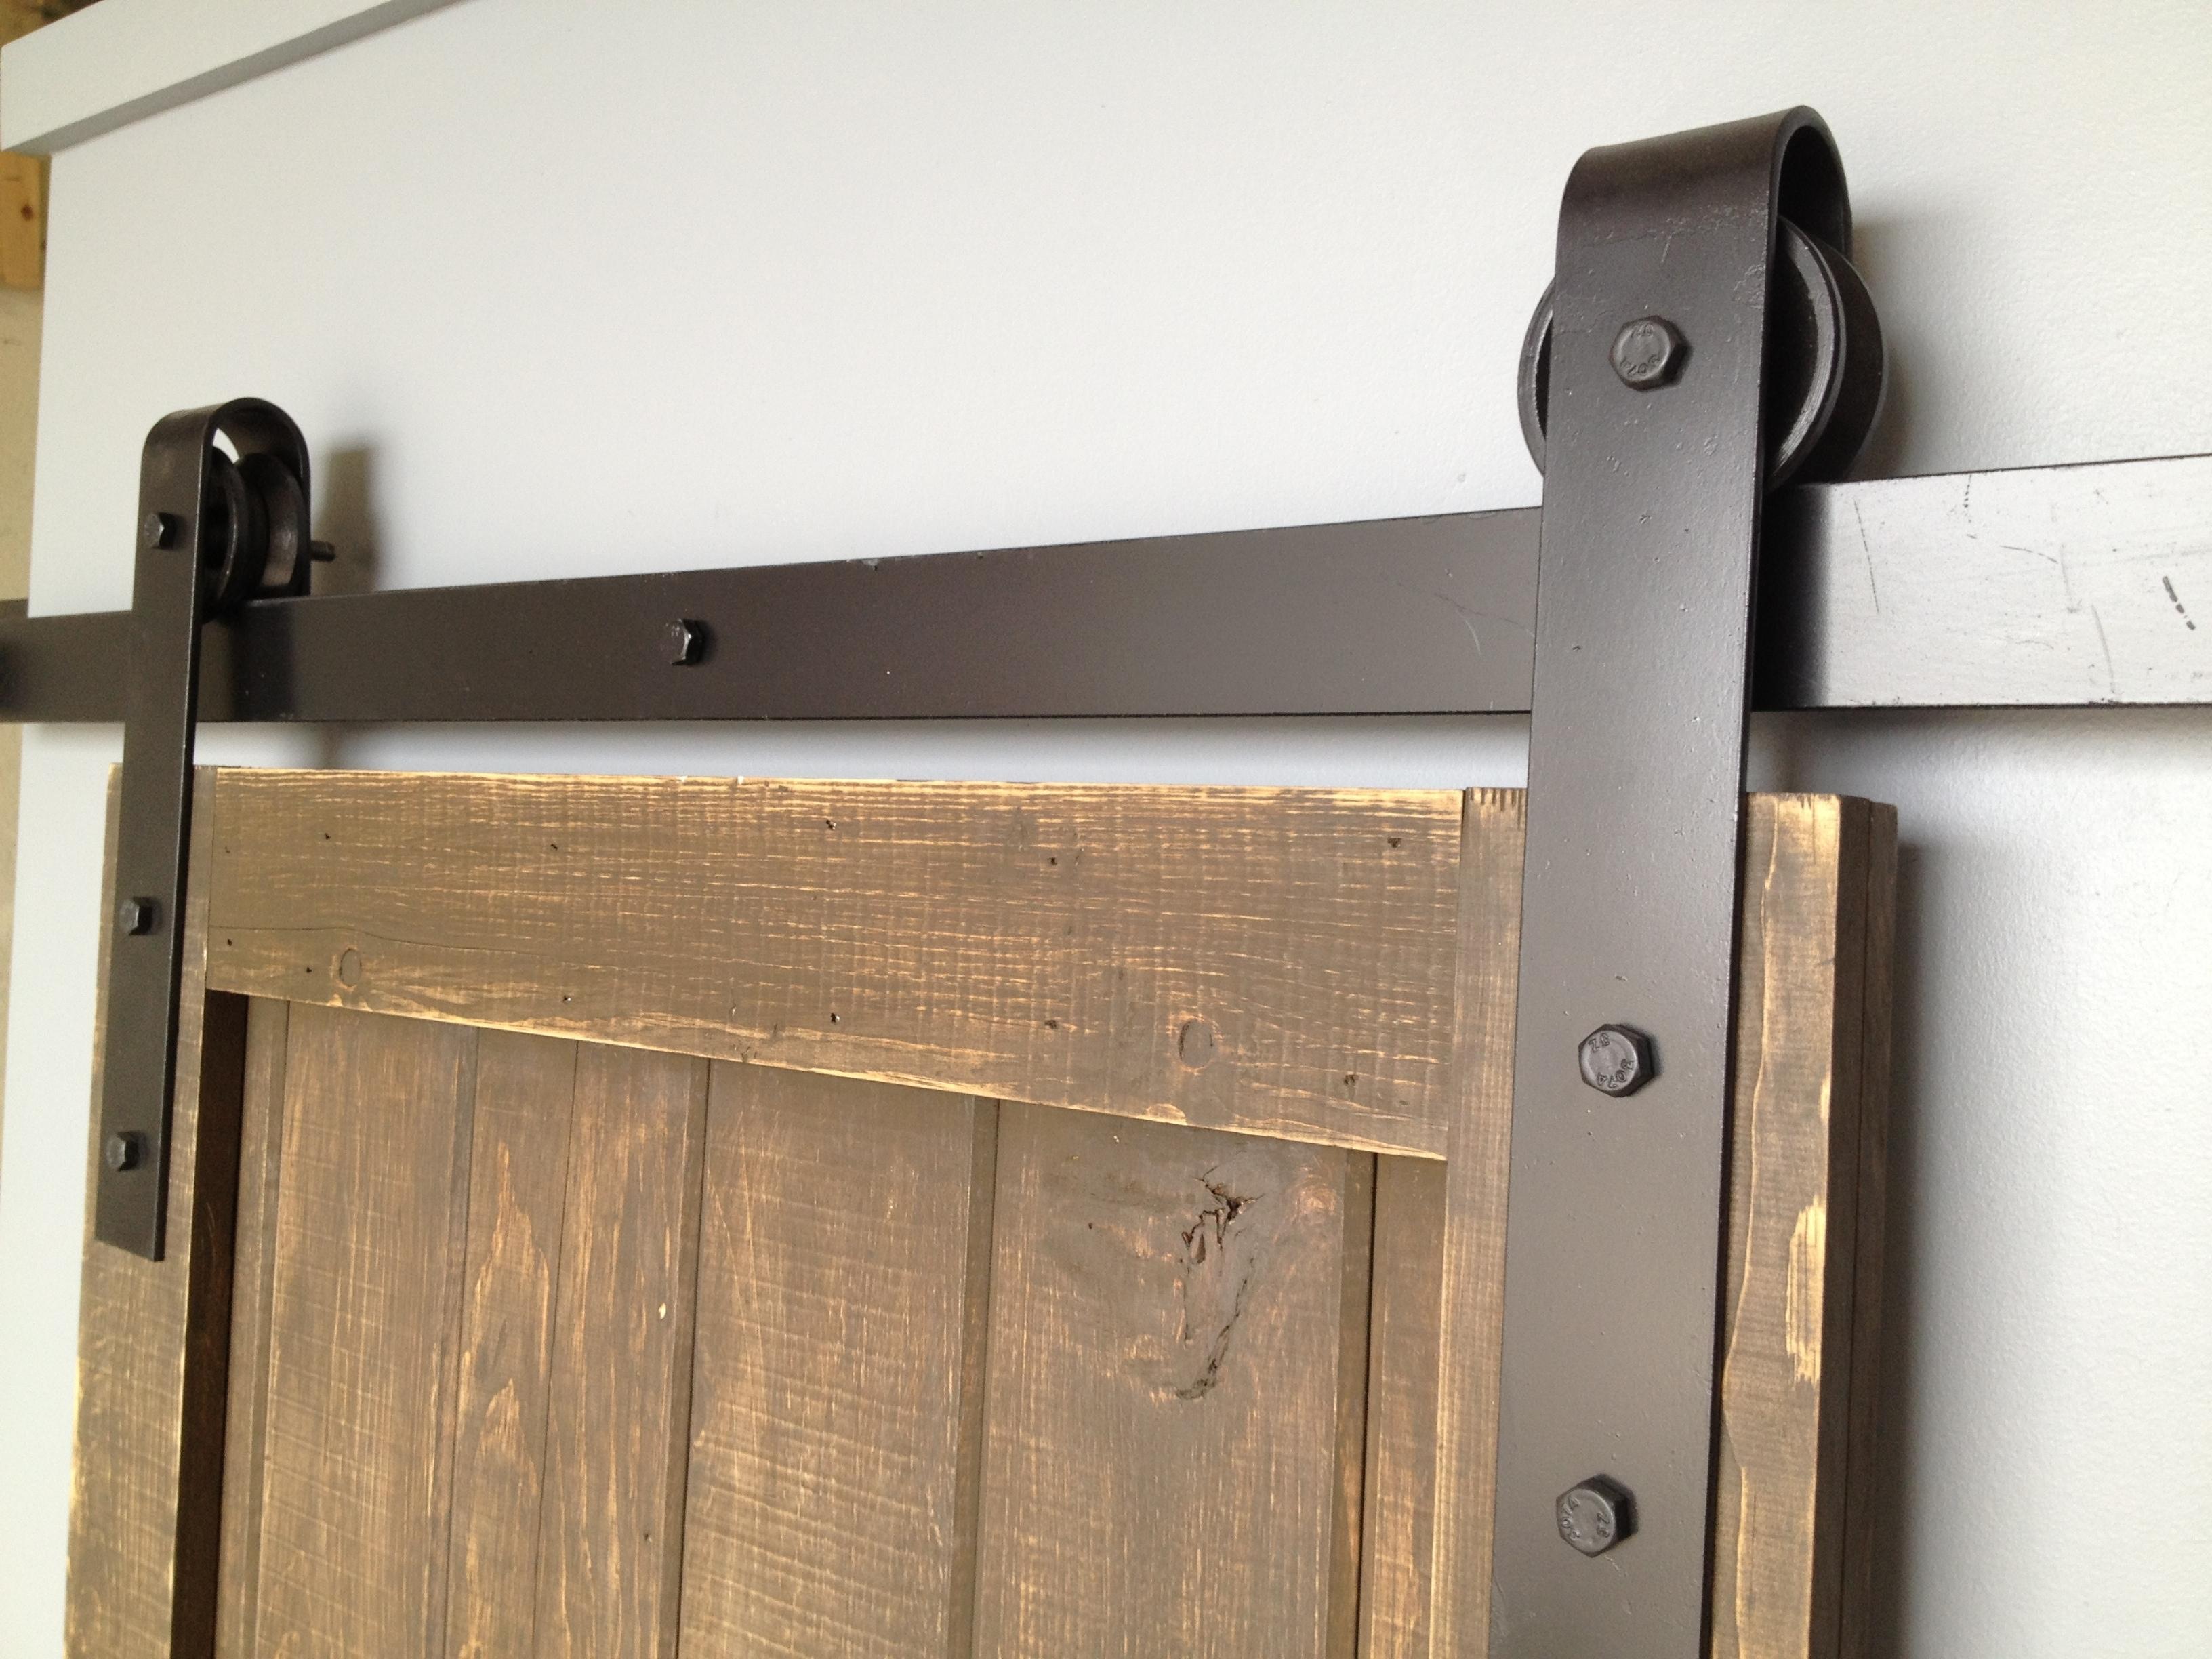 Real Sliding Barn Door Hardwarereal sliding door hardware barn door ideas